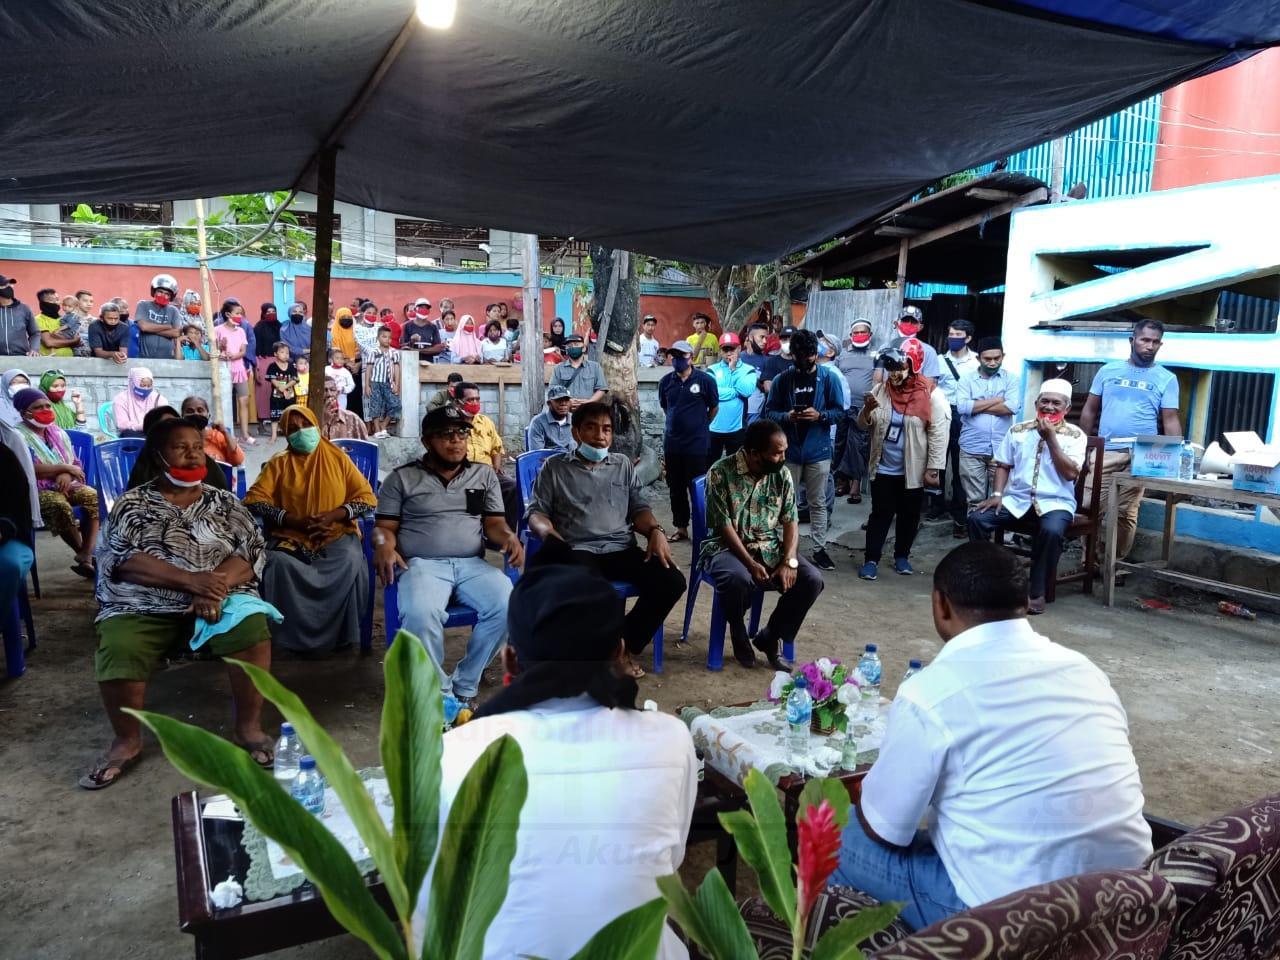 Komunitas Nelayan Borobudur Nyatakan Dukung HEBO di Pilkada Manokwari 2020 10 IMG 20201003 WA0007